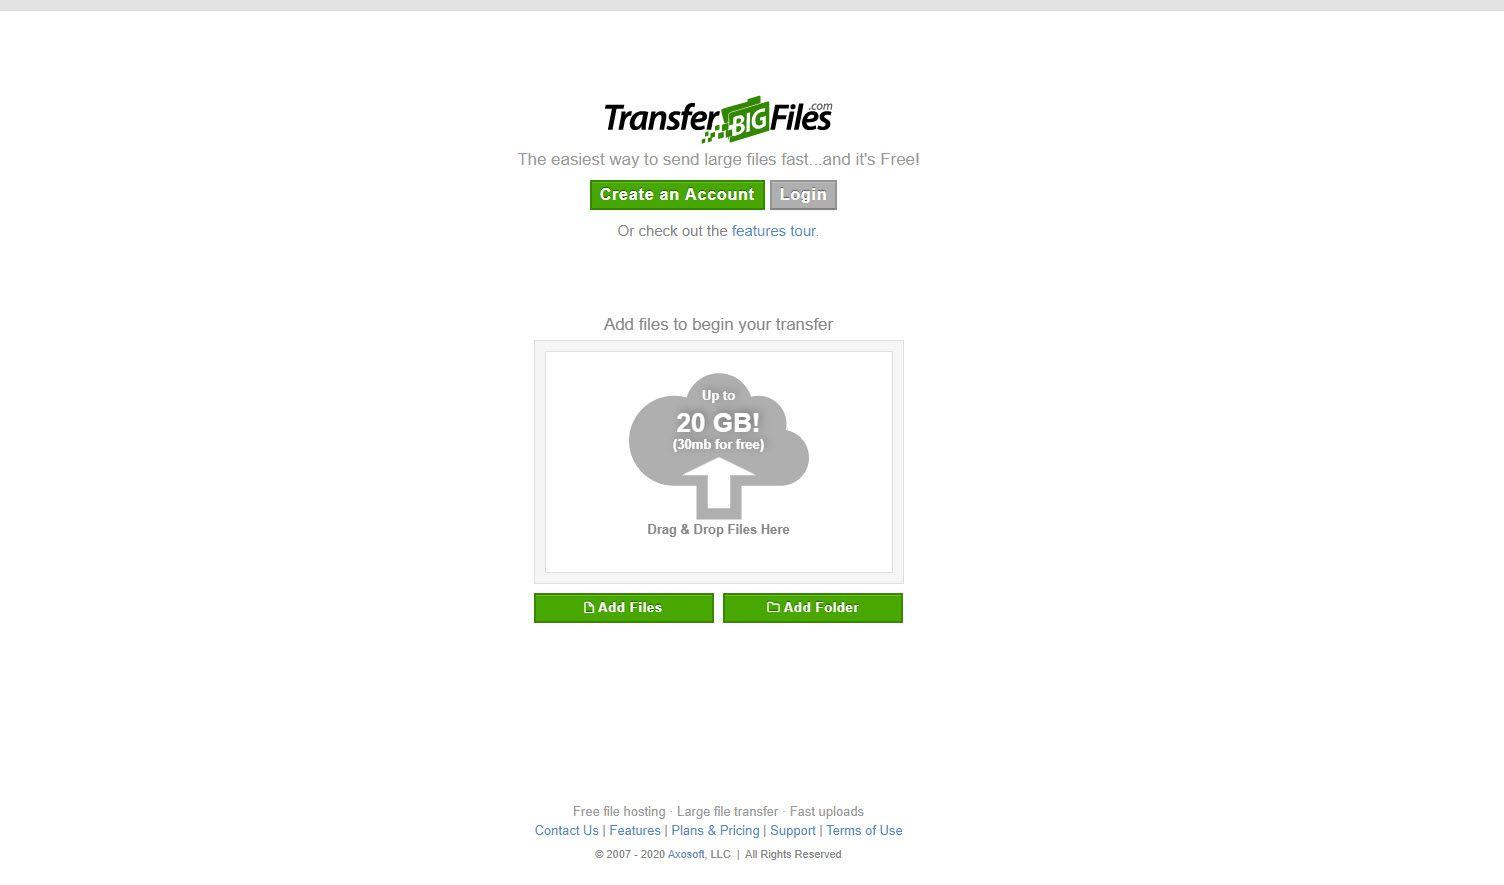 Screenshot of the TransferBigFiles website.